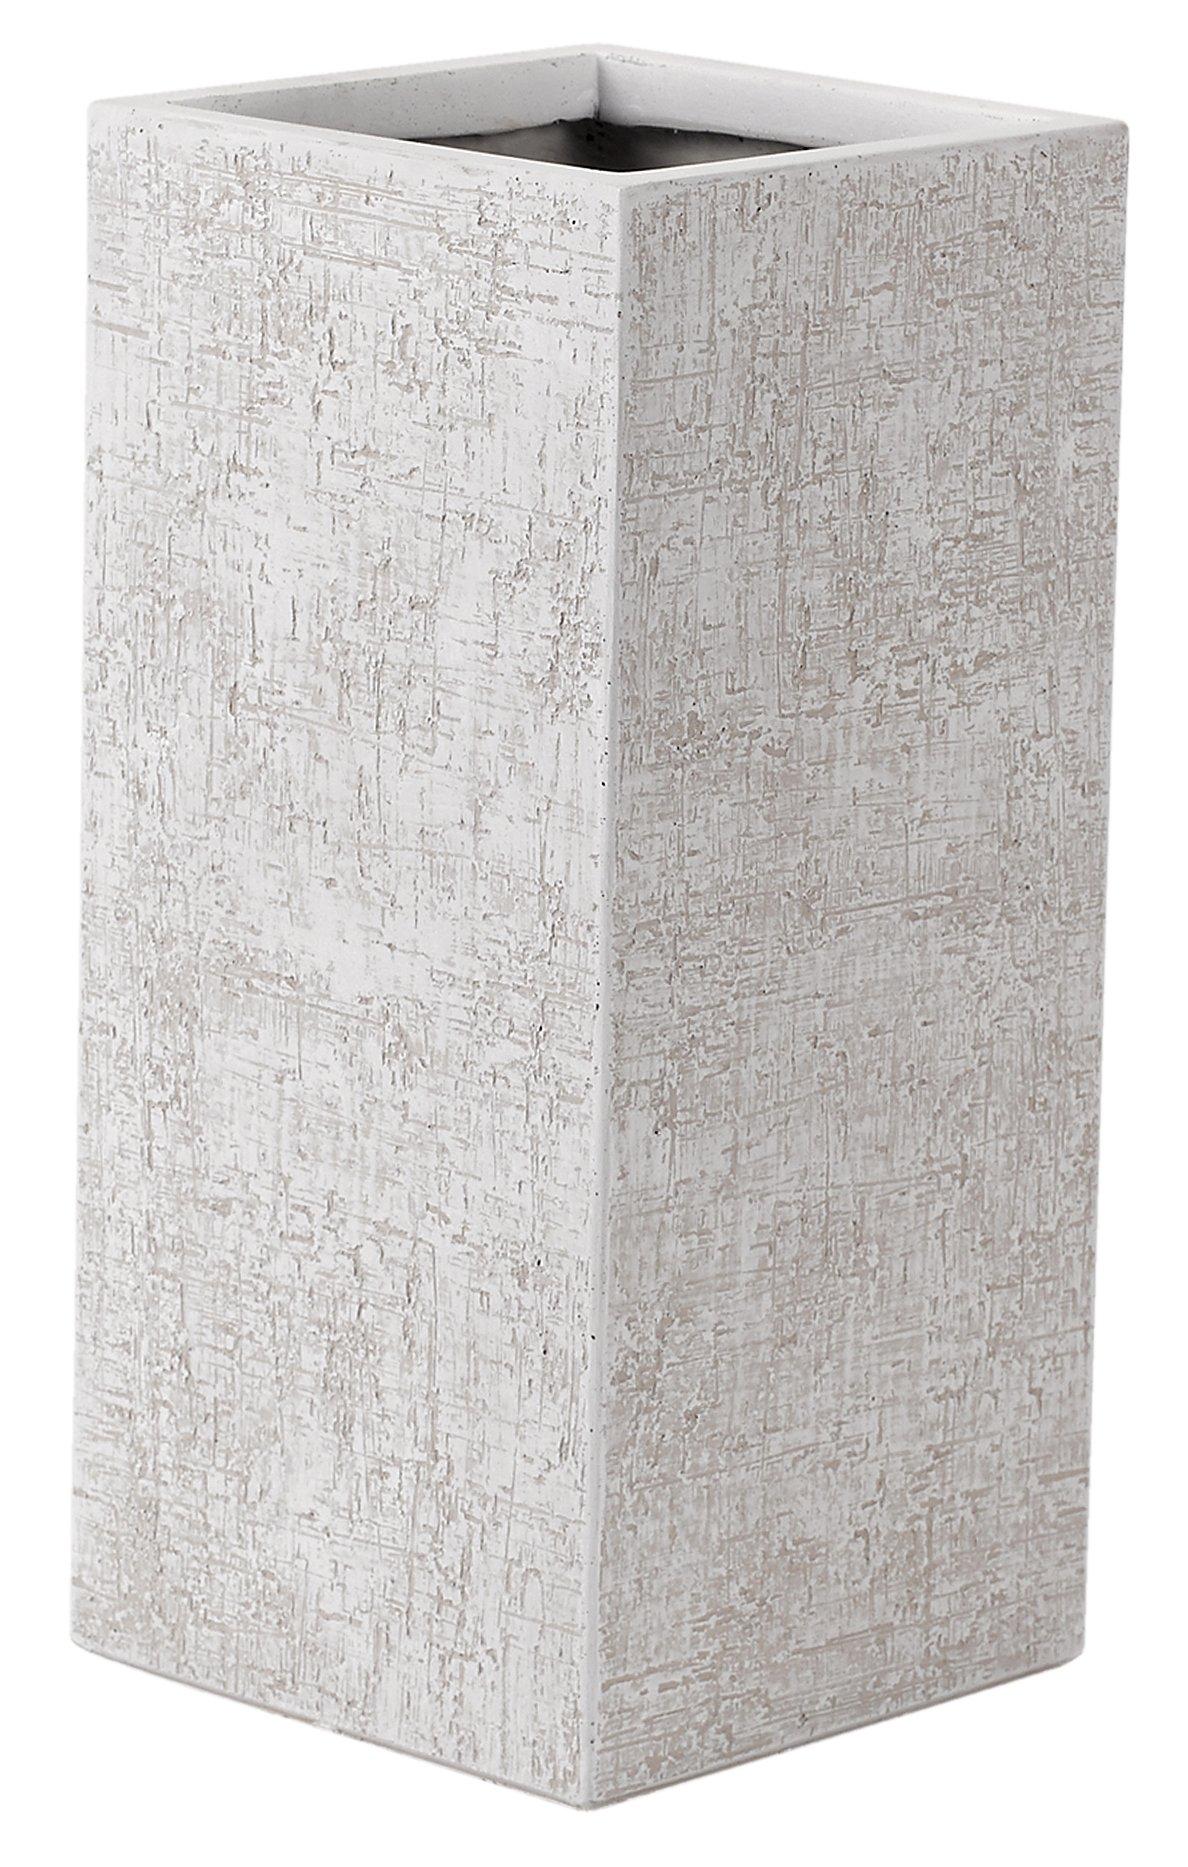 White Square Textured Planter - large